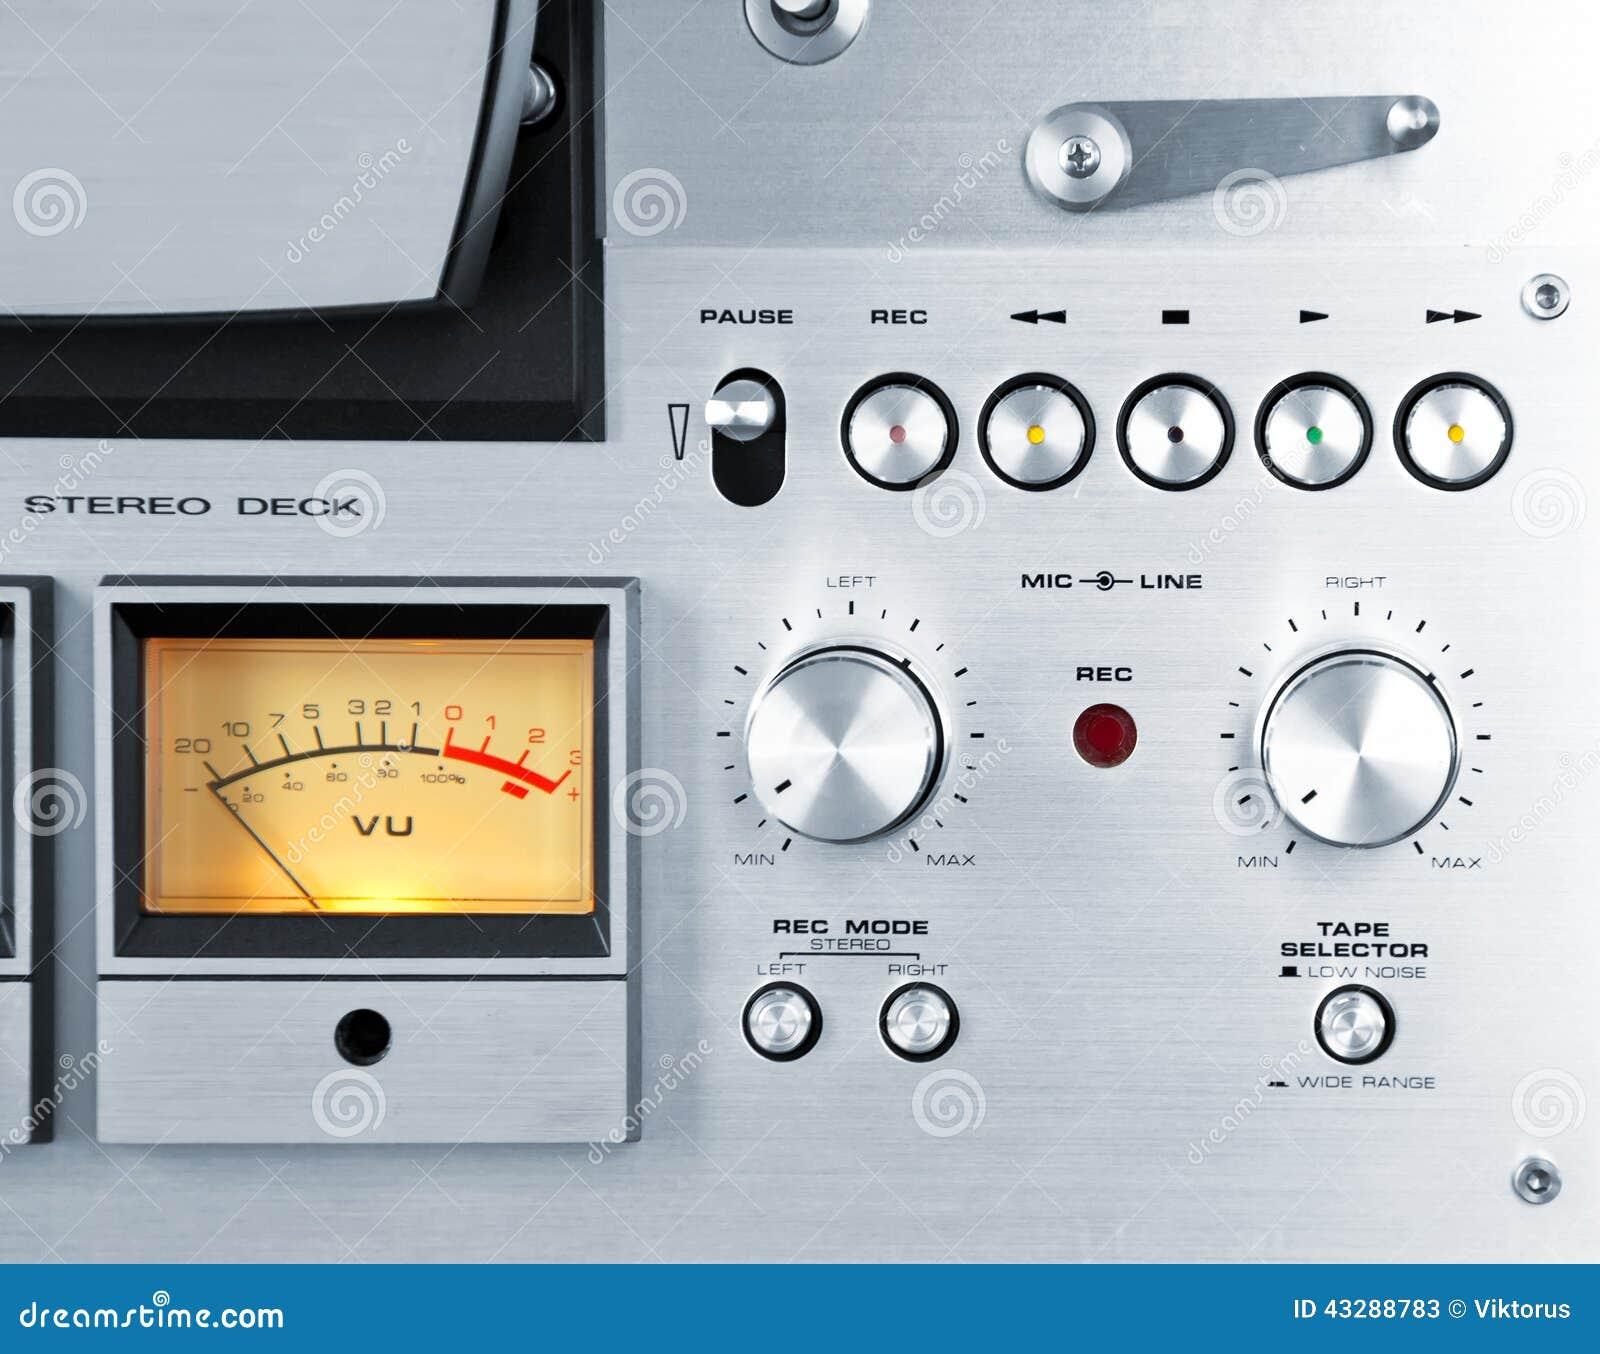 Analog Vu Meter : Analog stereo open reel tape deck recorder vu meter stock